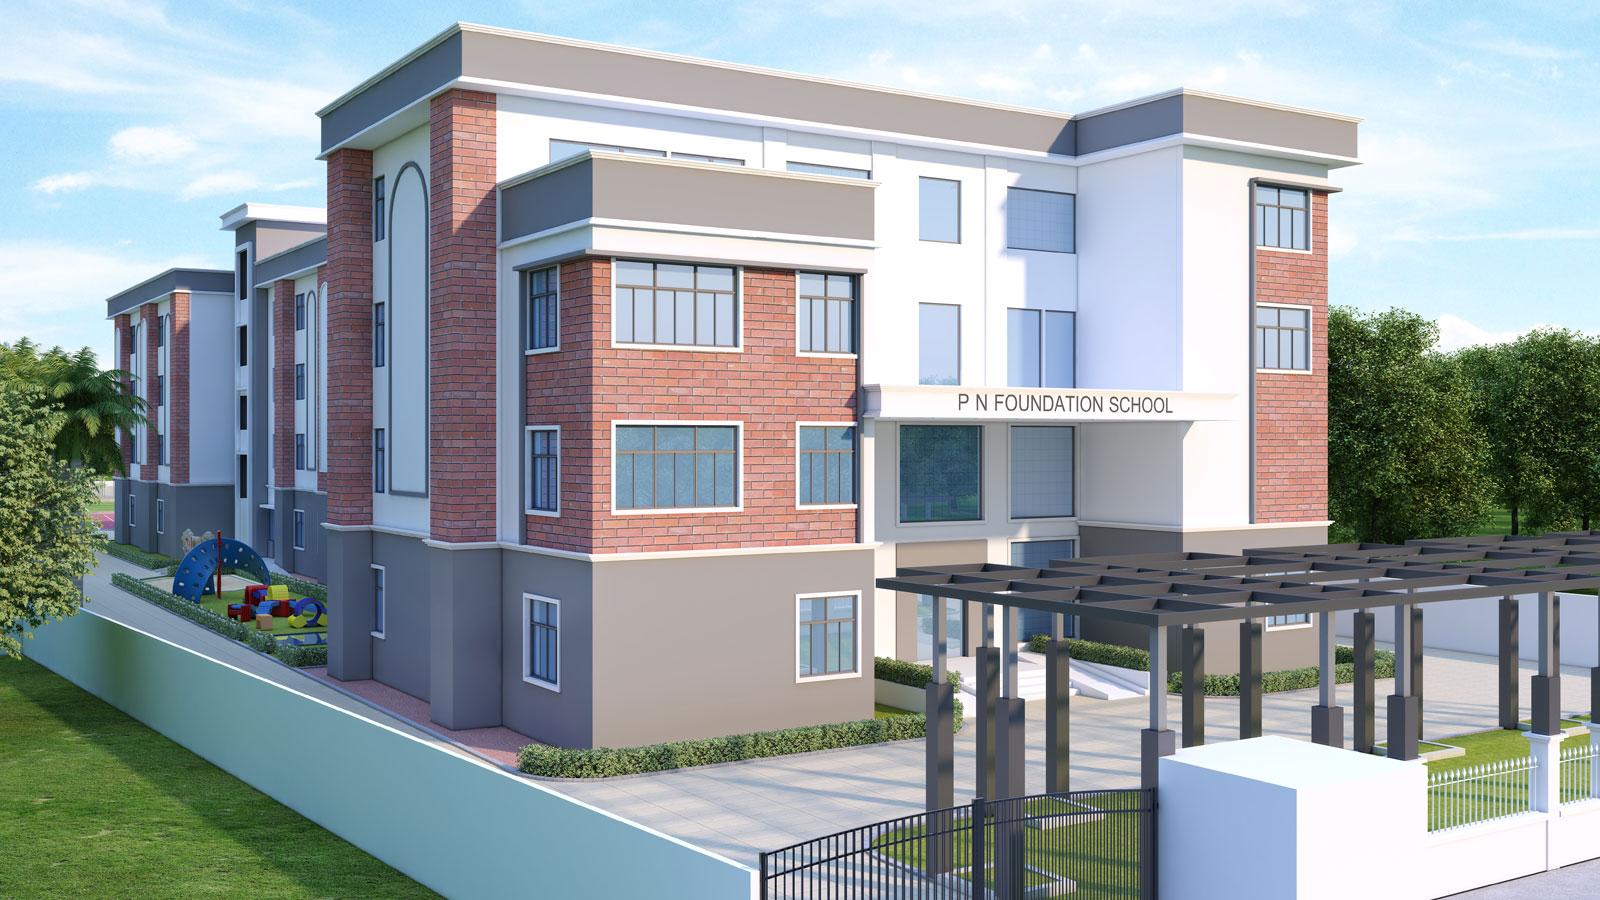 BEST IGCSE SCHOOL ARCHITECTS IN INDIA